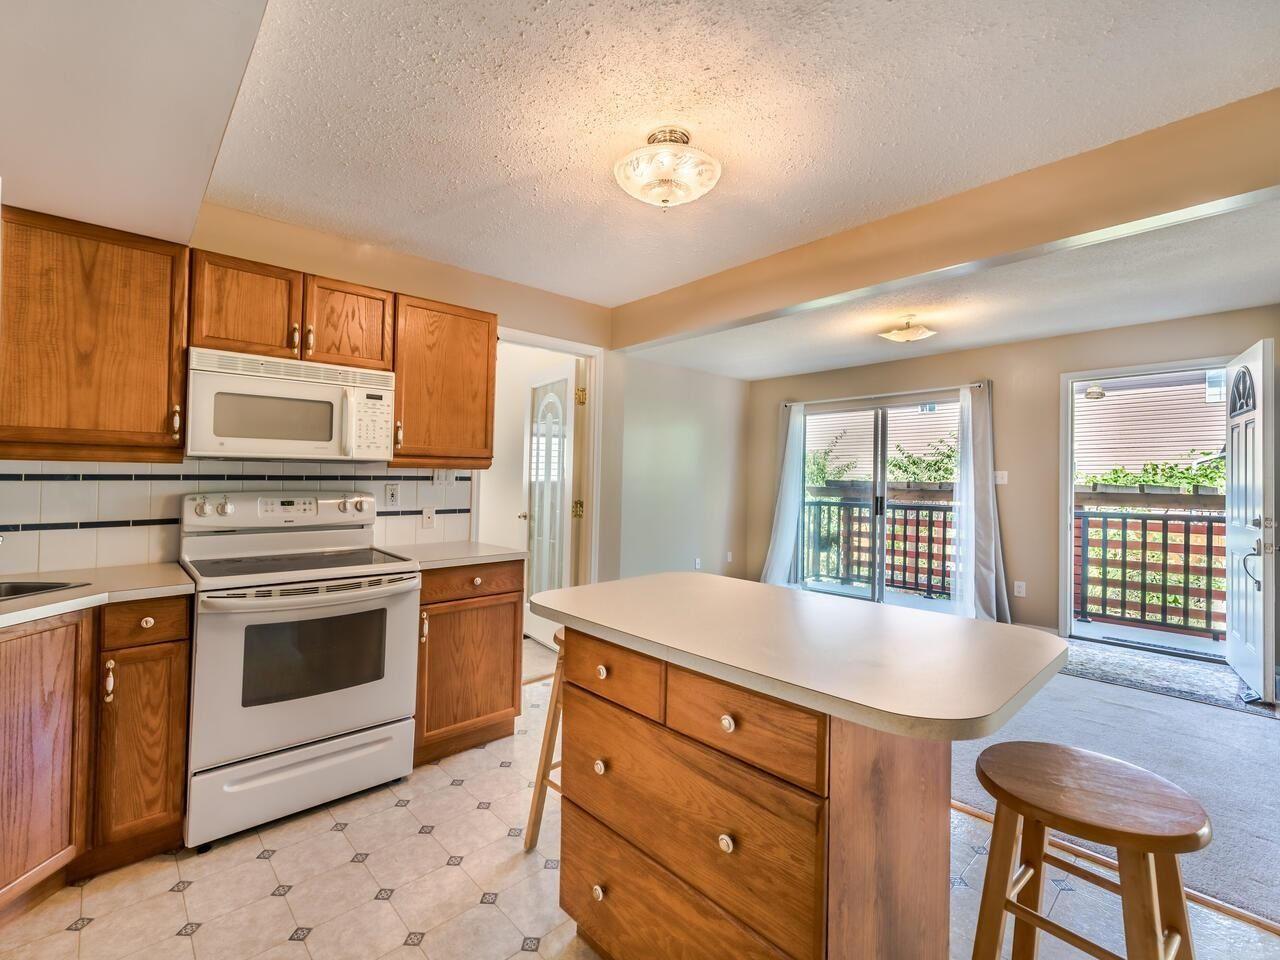 Photo 24: Photos: 5602 WILSON Court in Richmond: Hamilton RI House for sale : MLS®# R2602420